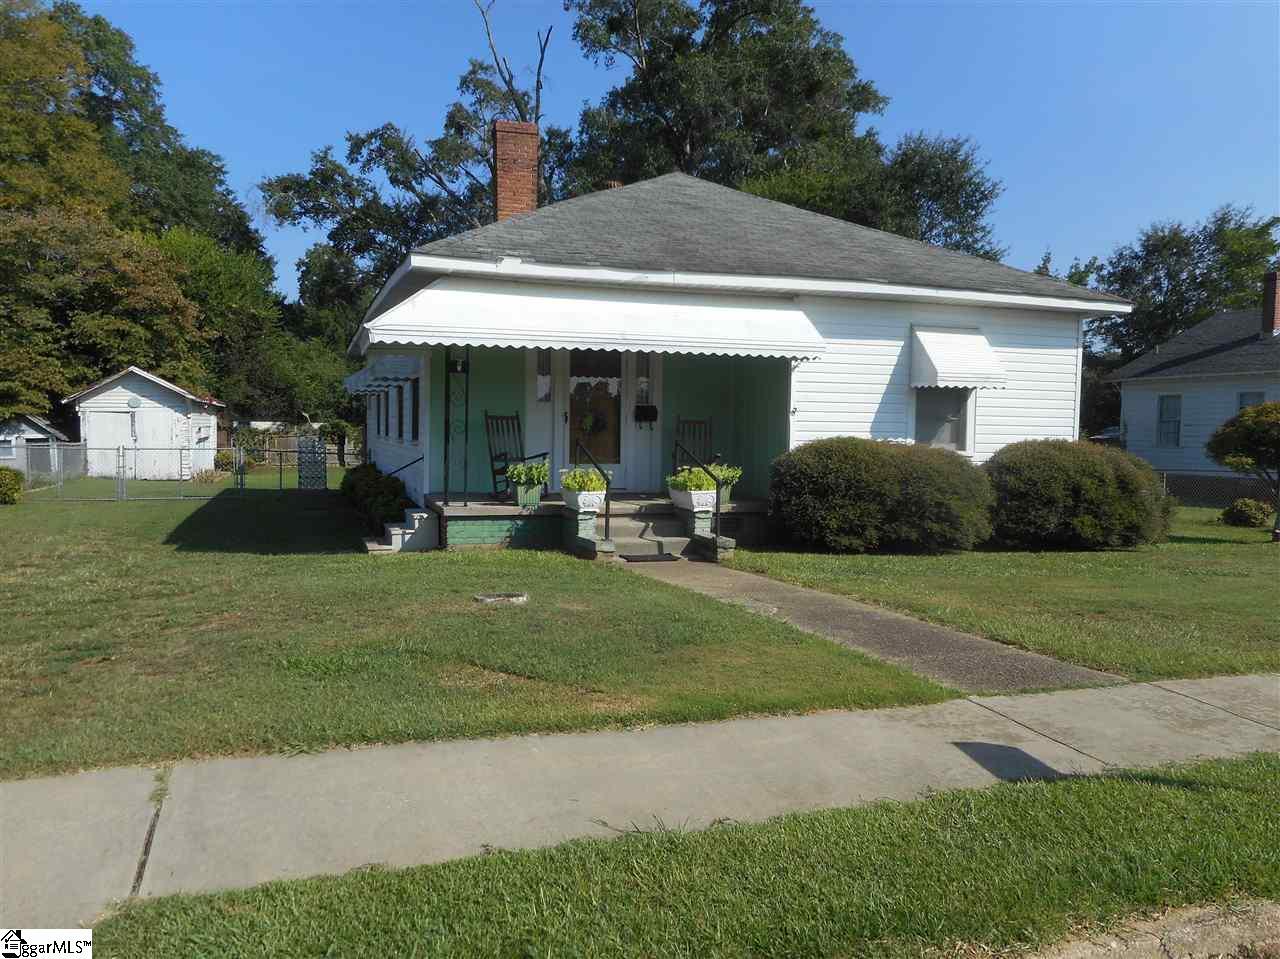 206 W Calhoun Street Joanna, SC 29351